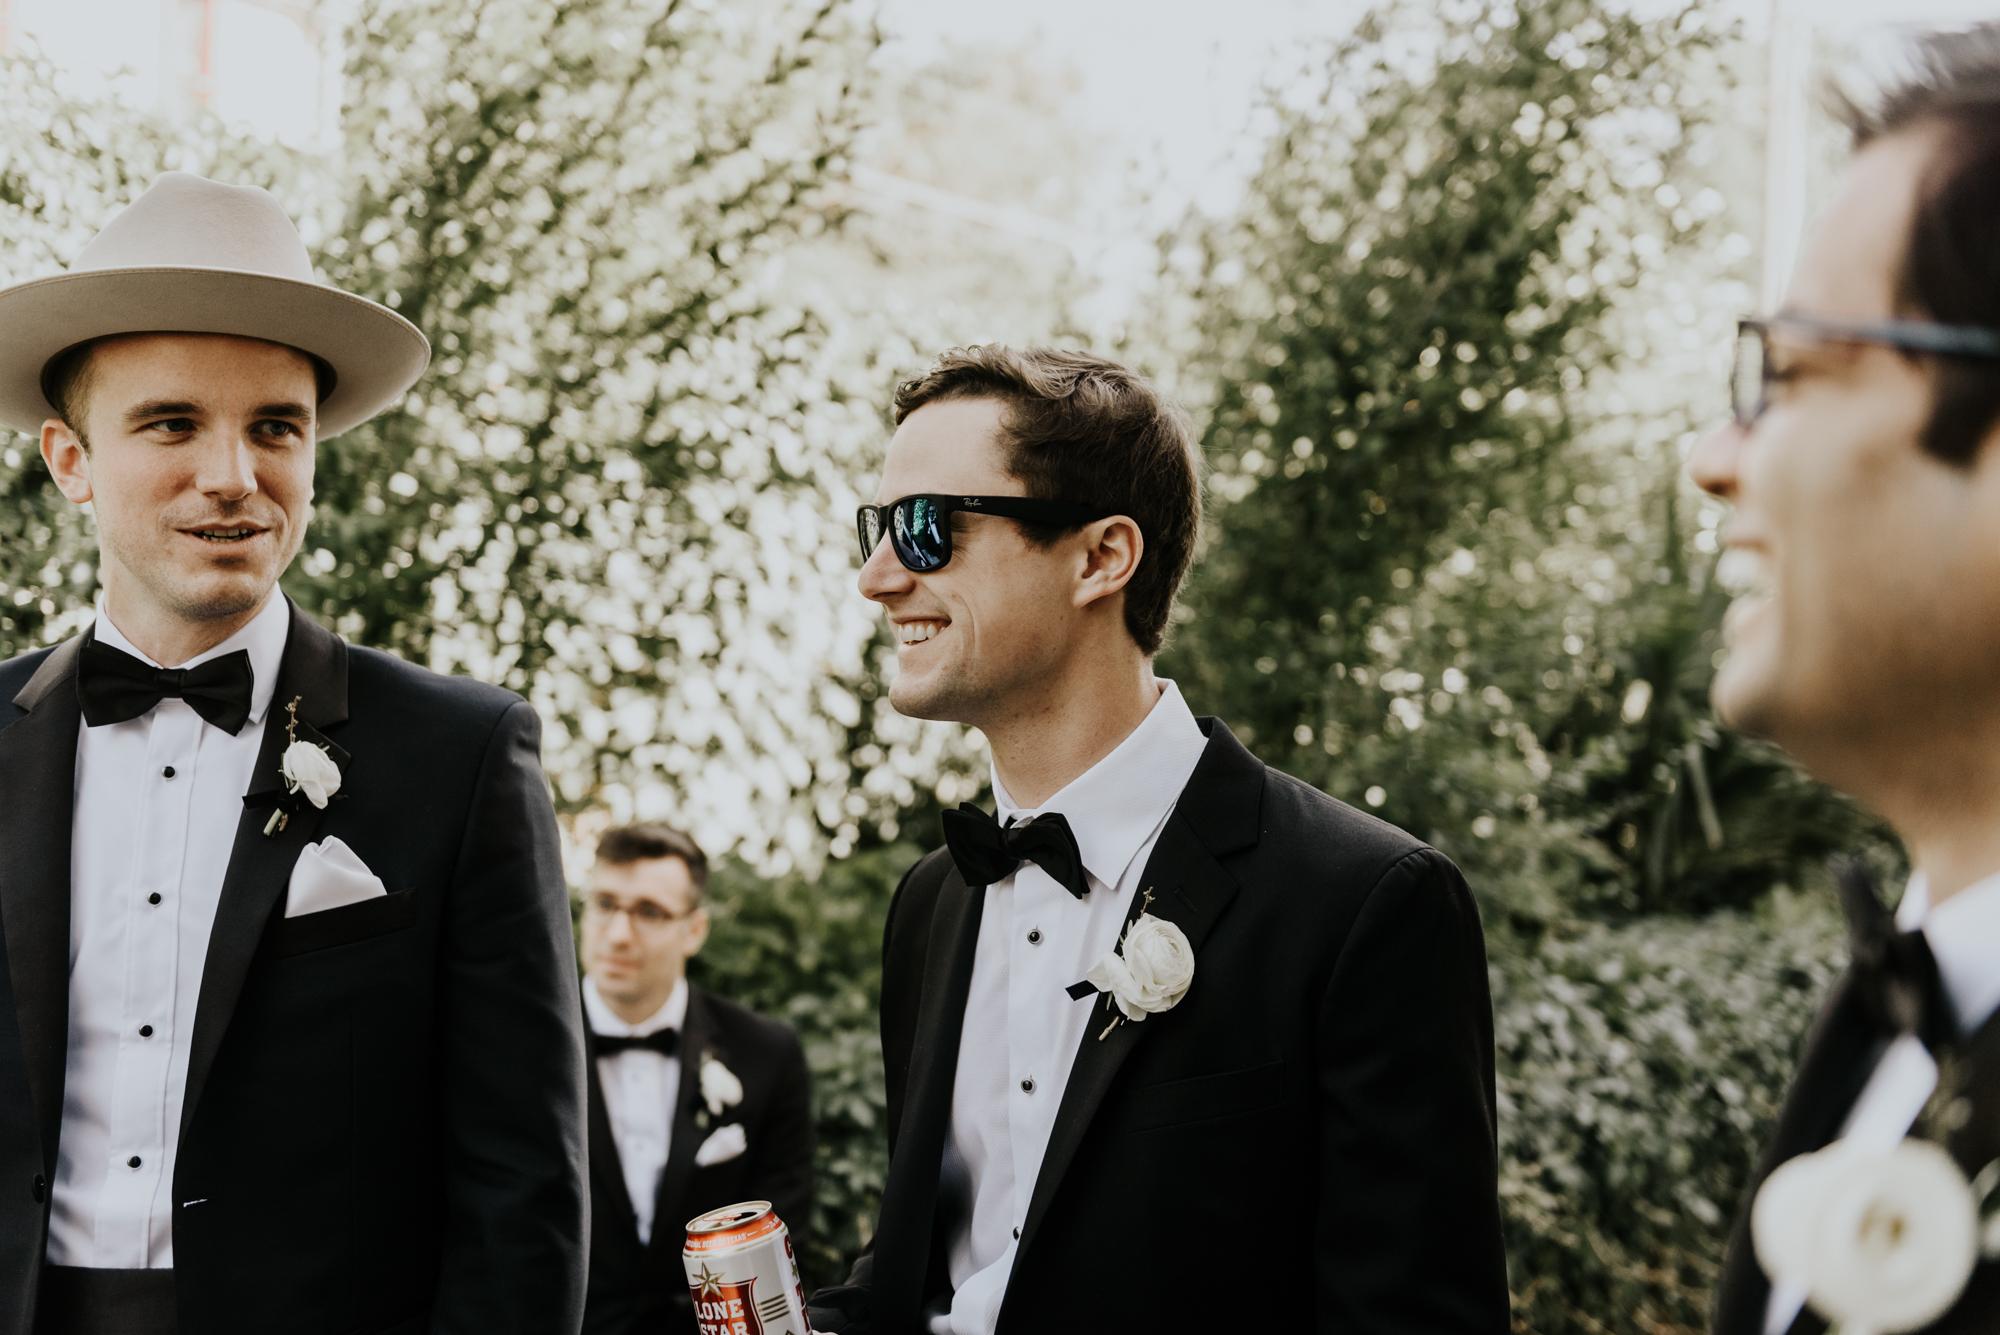 Intimate Wedding Day Photos Austin, Texas